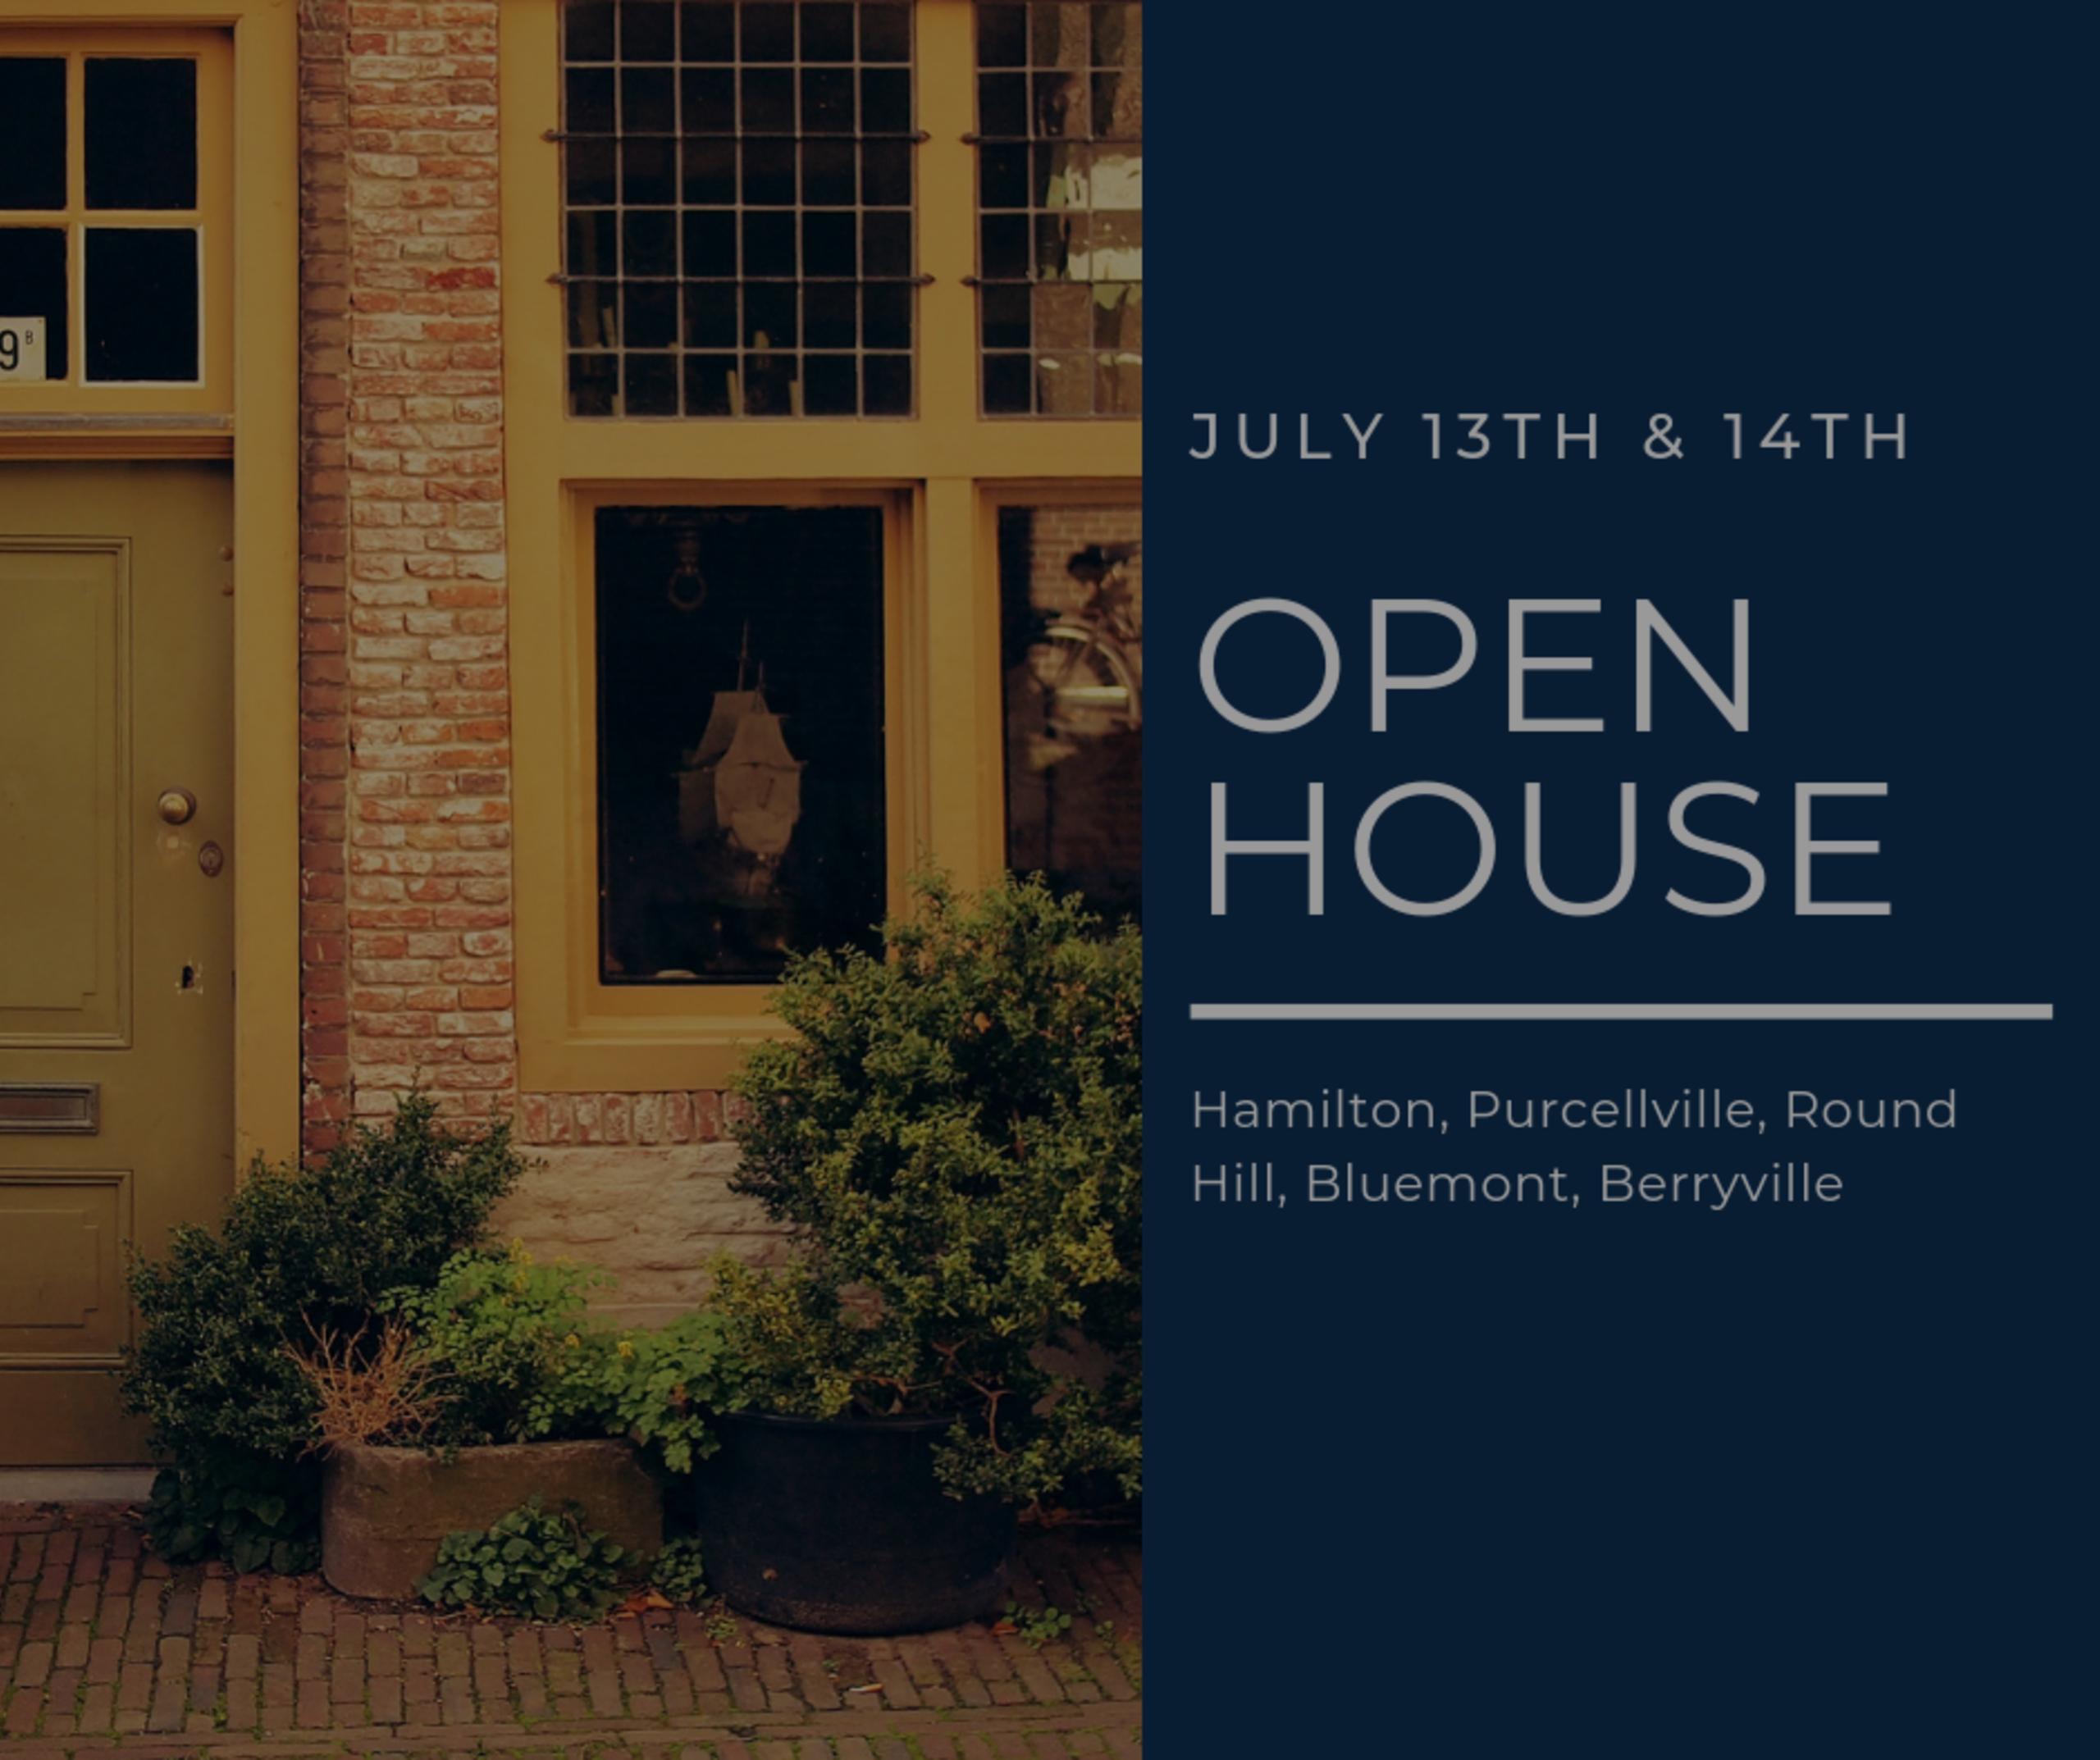 Open House List 7/13/19 – 7/14/19